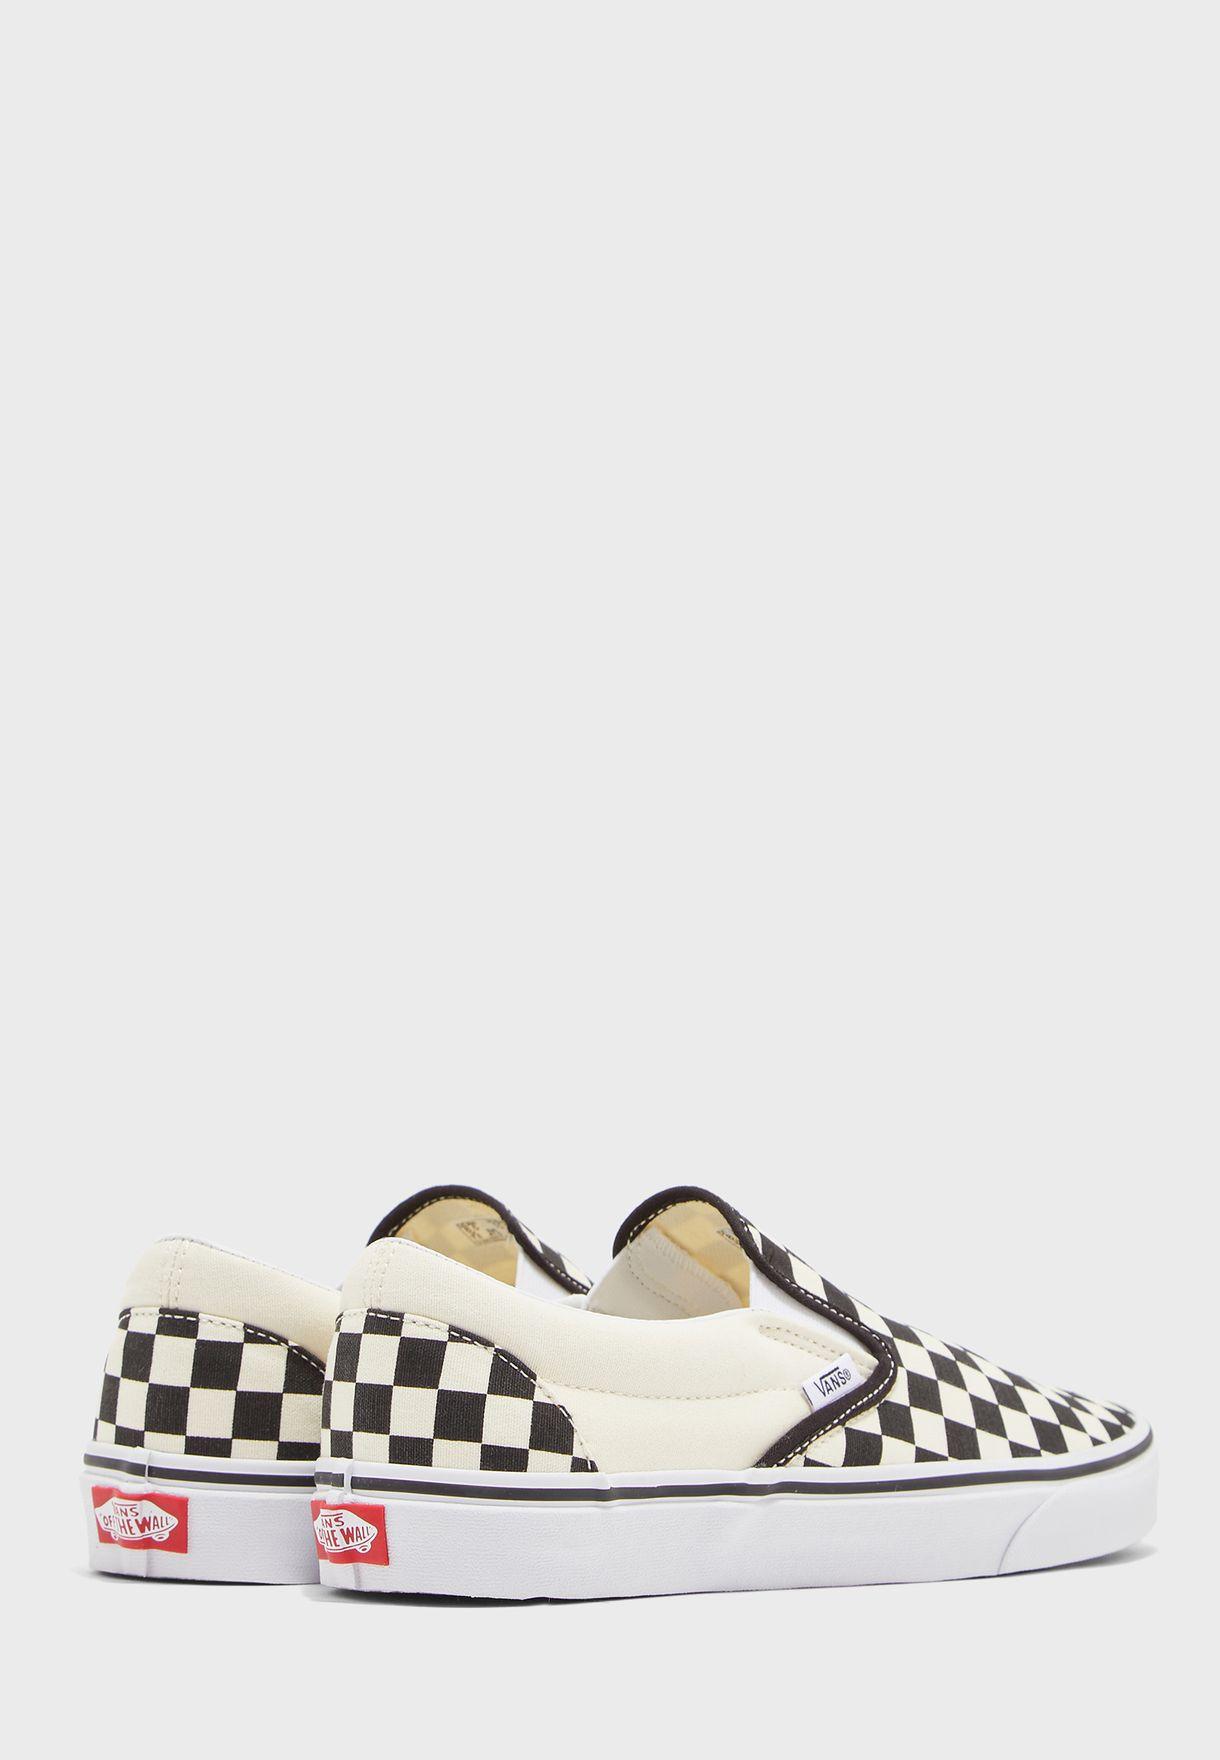 Classic Checkerboard Slip Ons